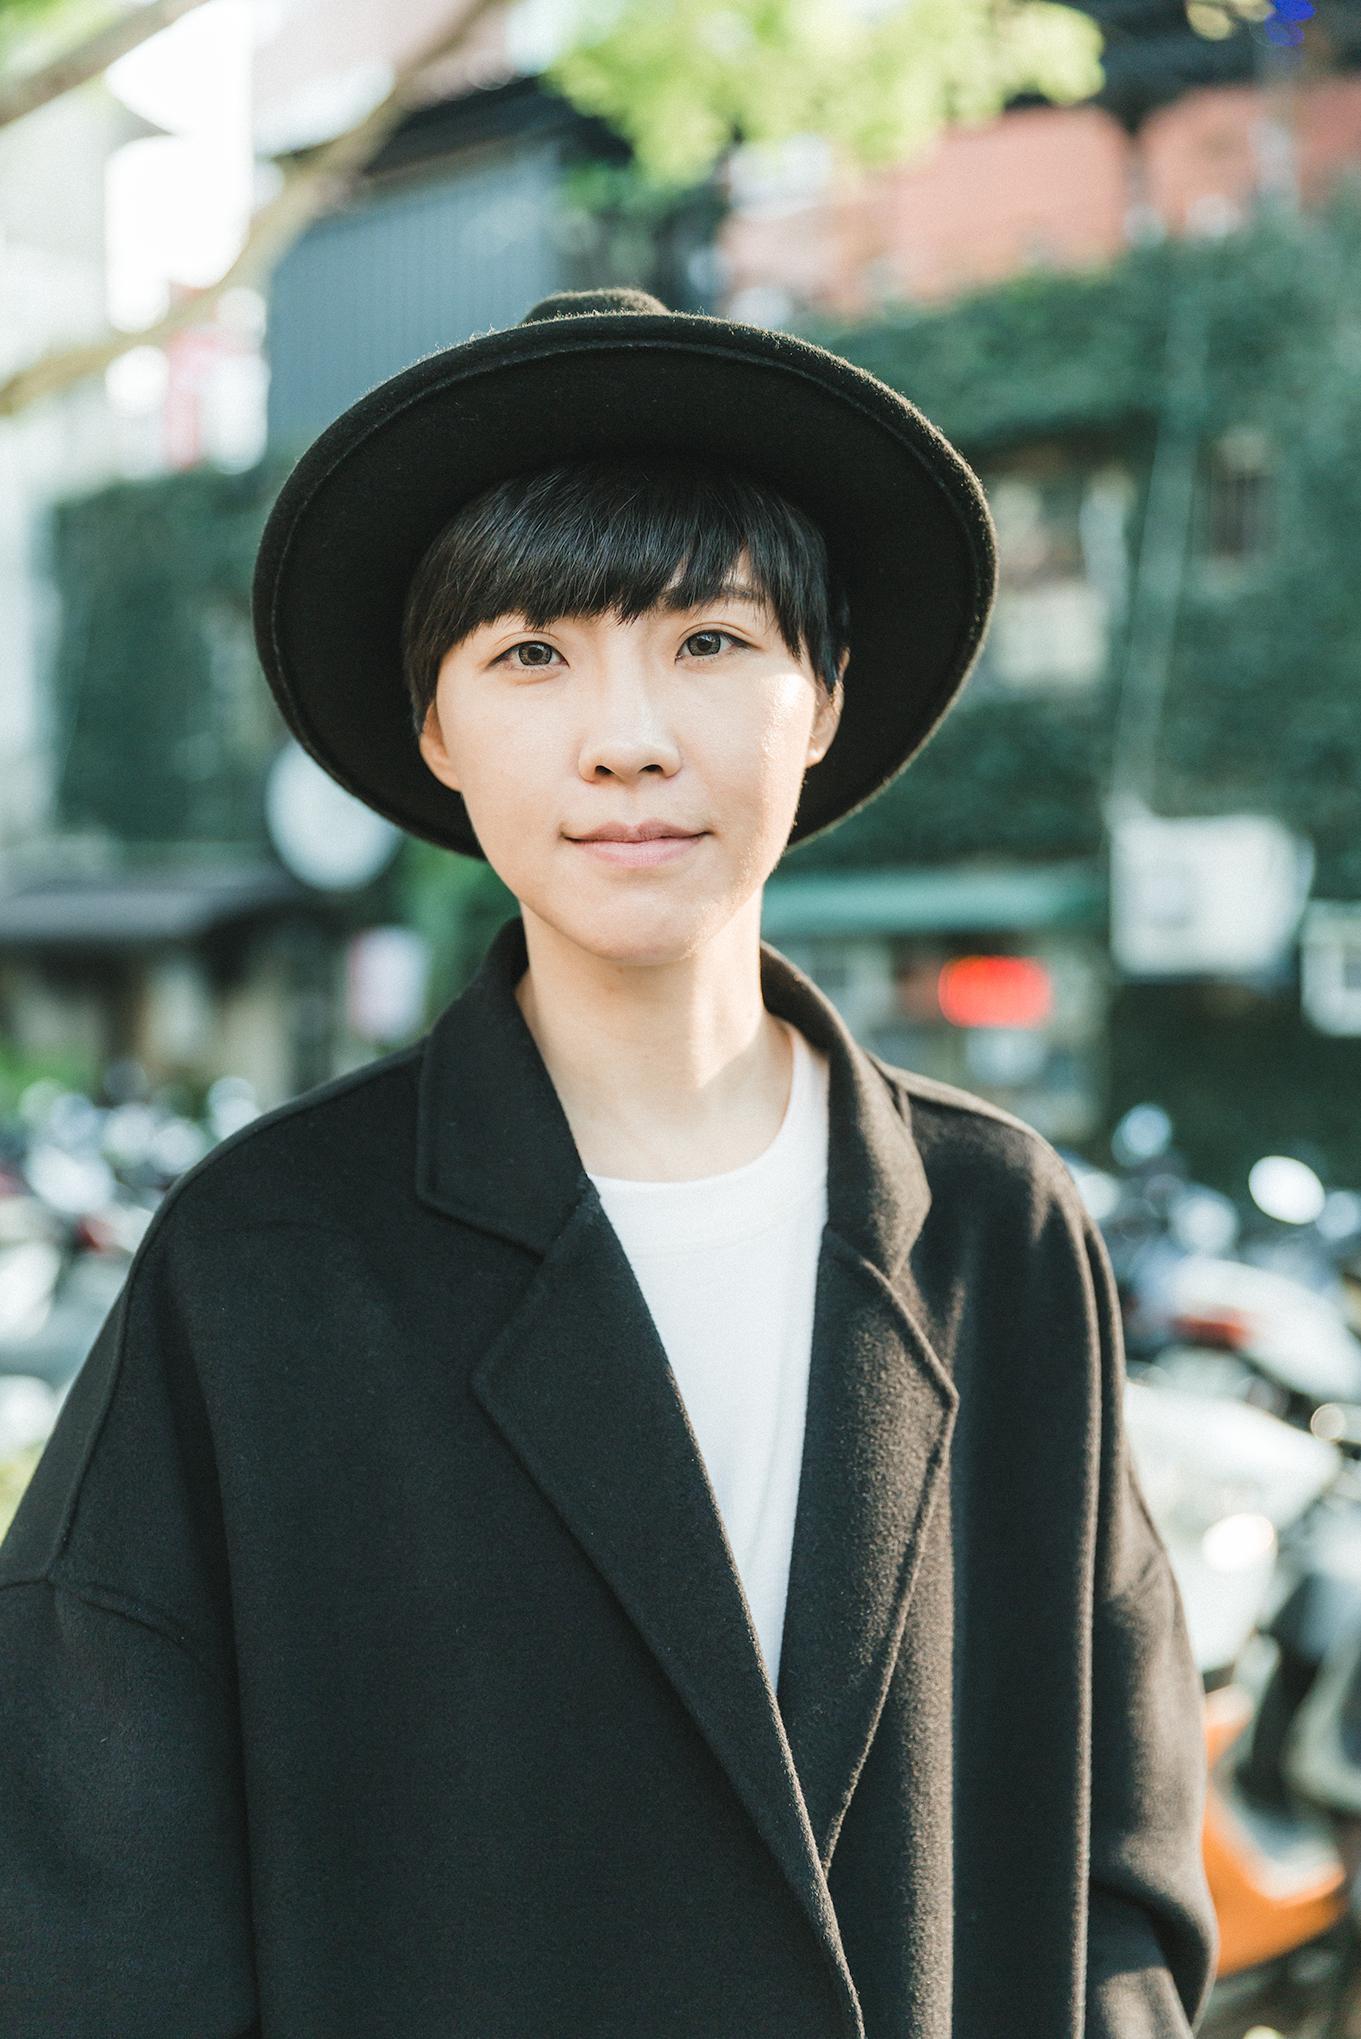 People Portrait Editorial | Charmaine Wu Photography Singapore